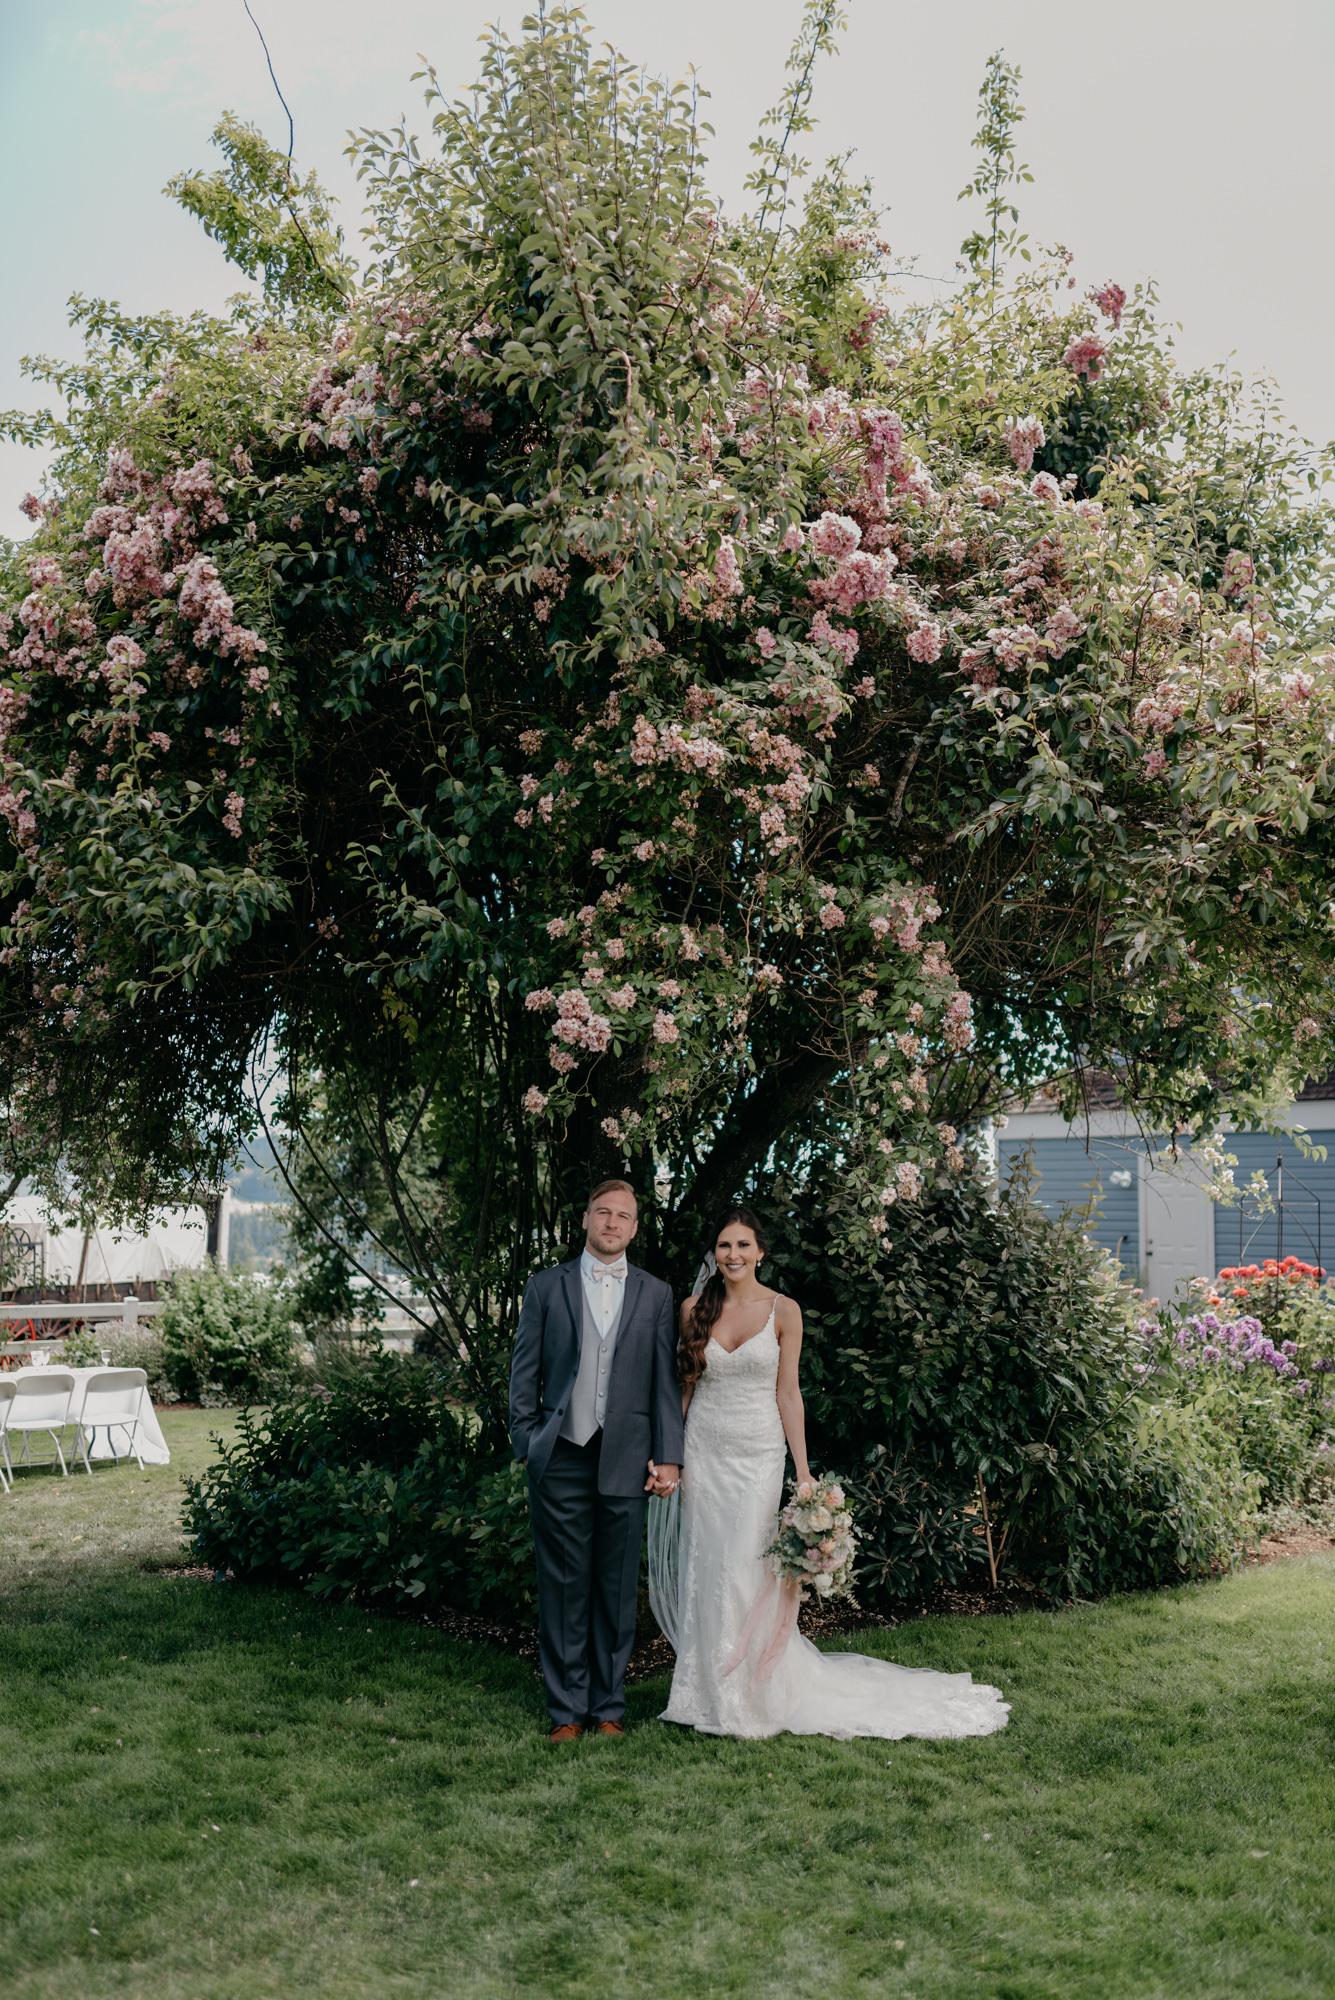 82-lake-oswego-wedding-portland-couple-rose-tree.jpg